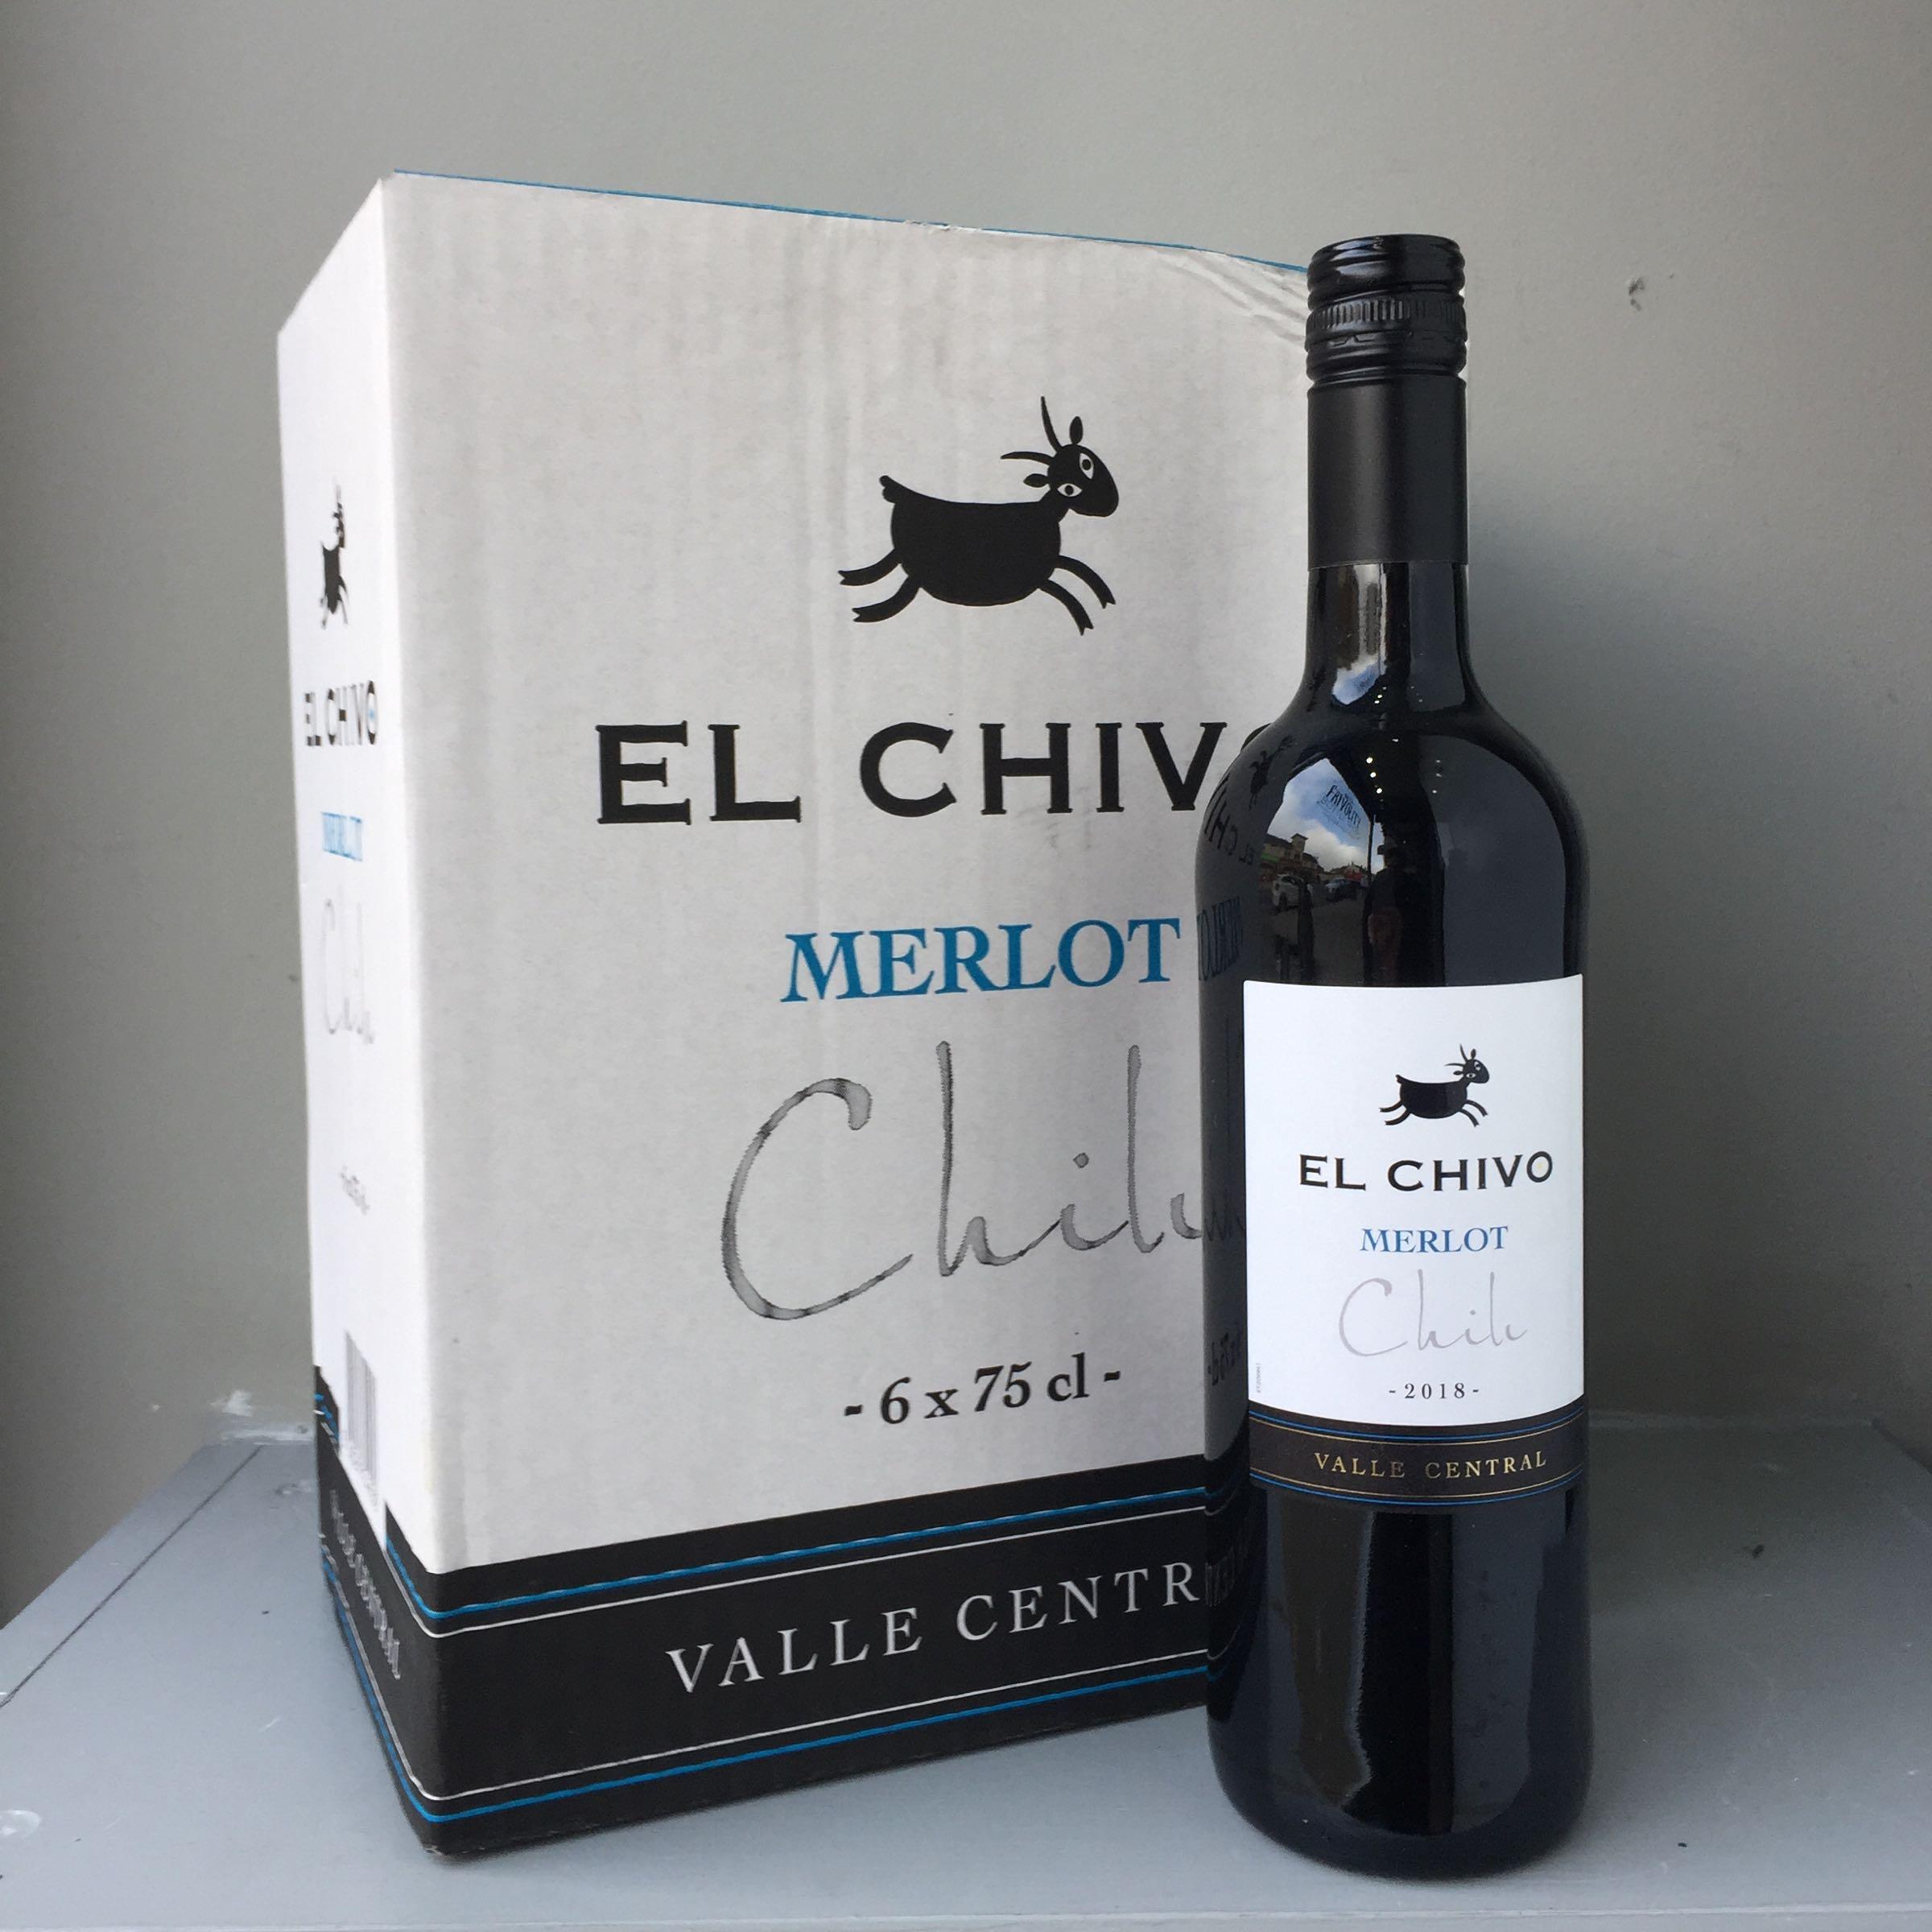 El Chivo Merlot, Case Deal